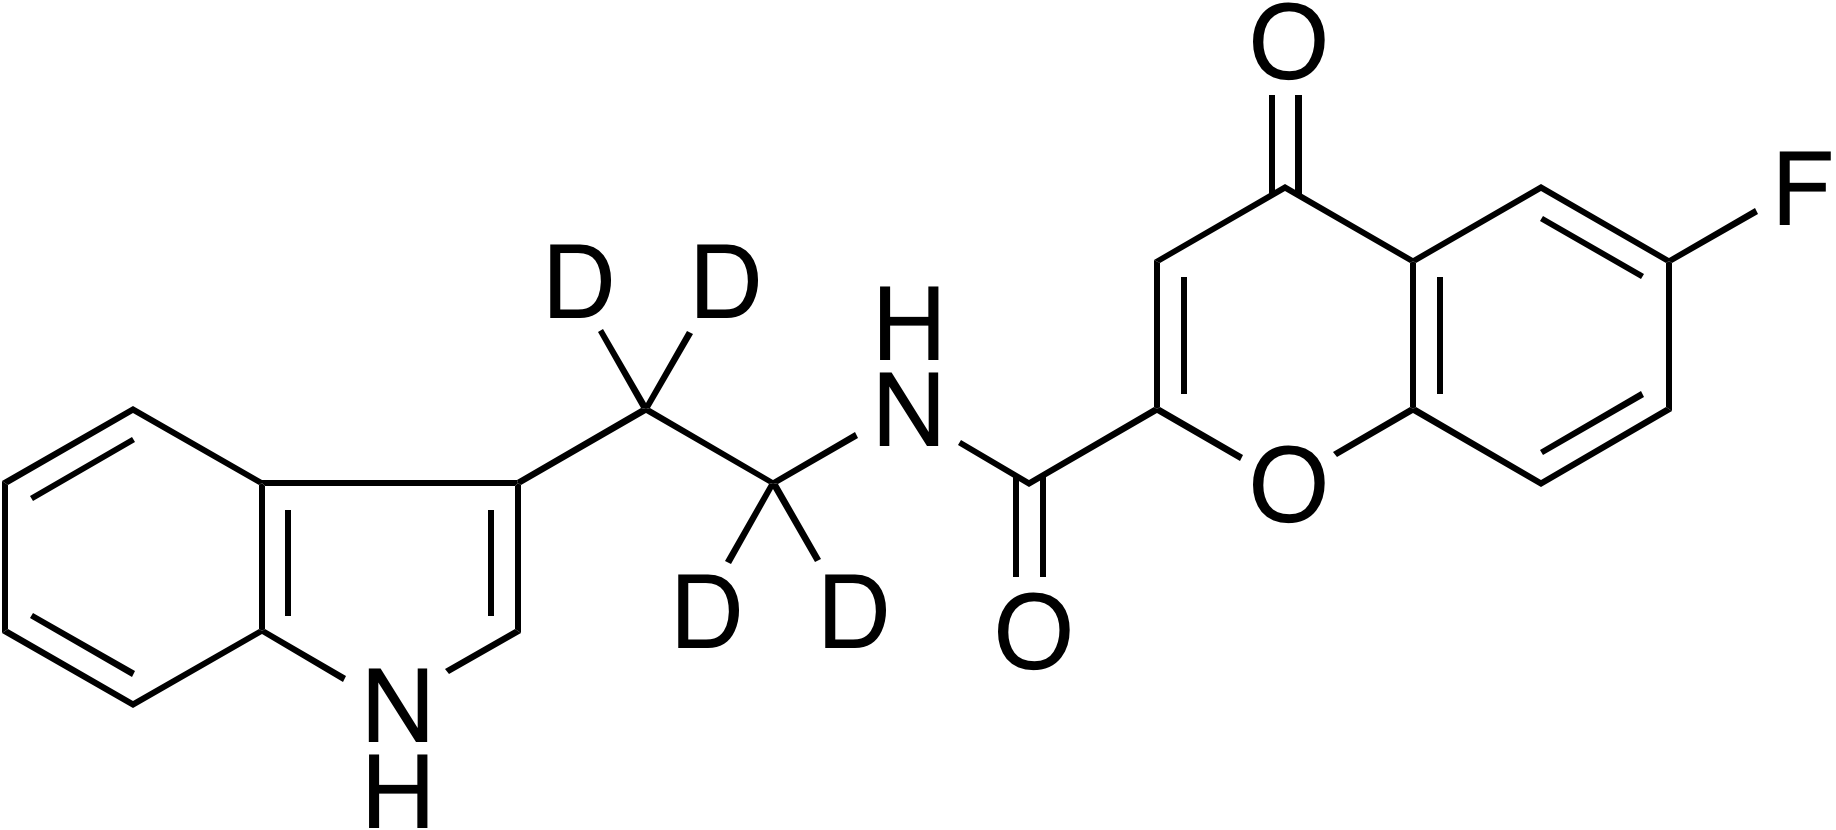 N-(2-(1H-Indol-3-yl)ethyl-d<sub>4</sub>)-6-fluoro-4-oxo-4H-chromene-2-carboxamide